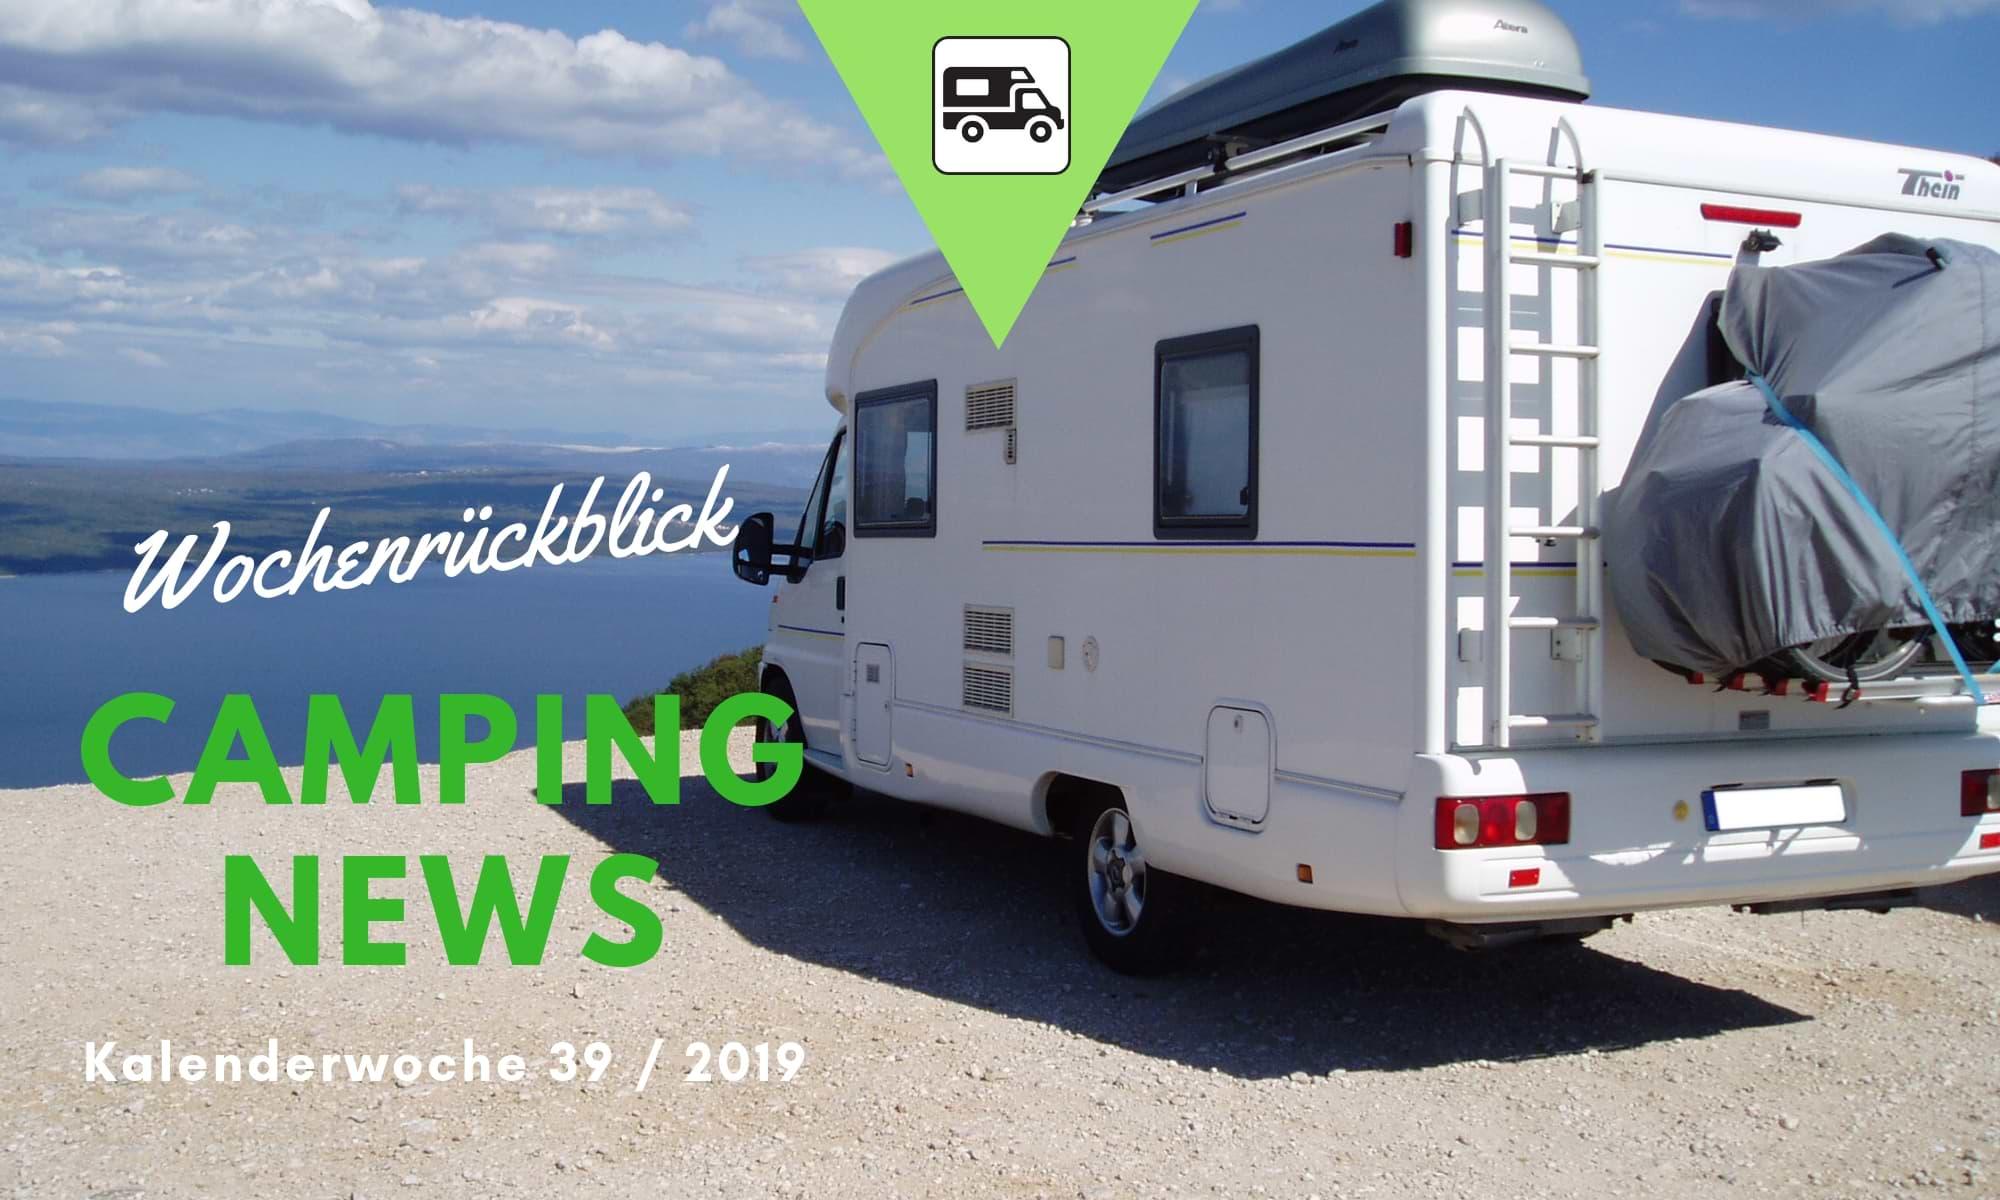 Wochenrückblick Camping News KW39-2019